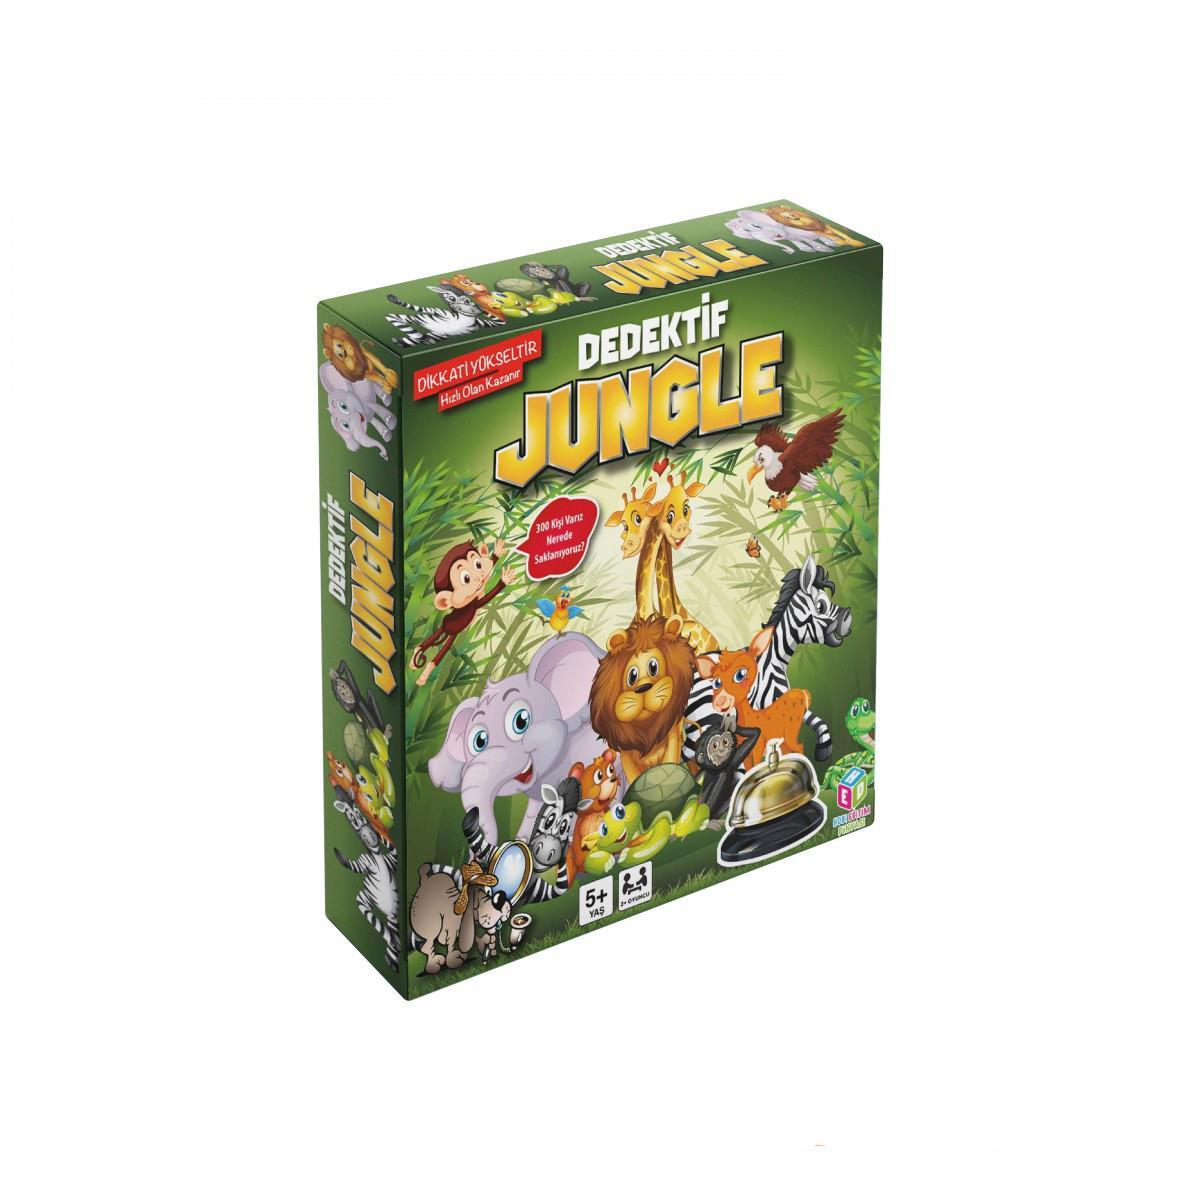 Dedektif Jungle Seç - Göster Oyunu